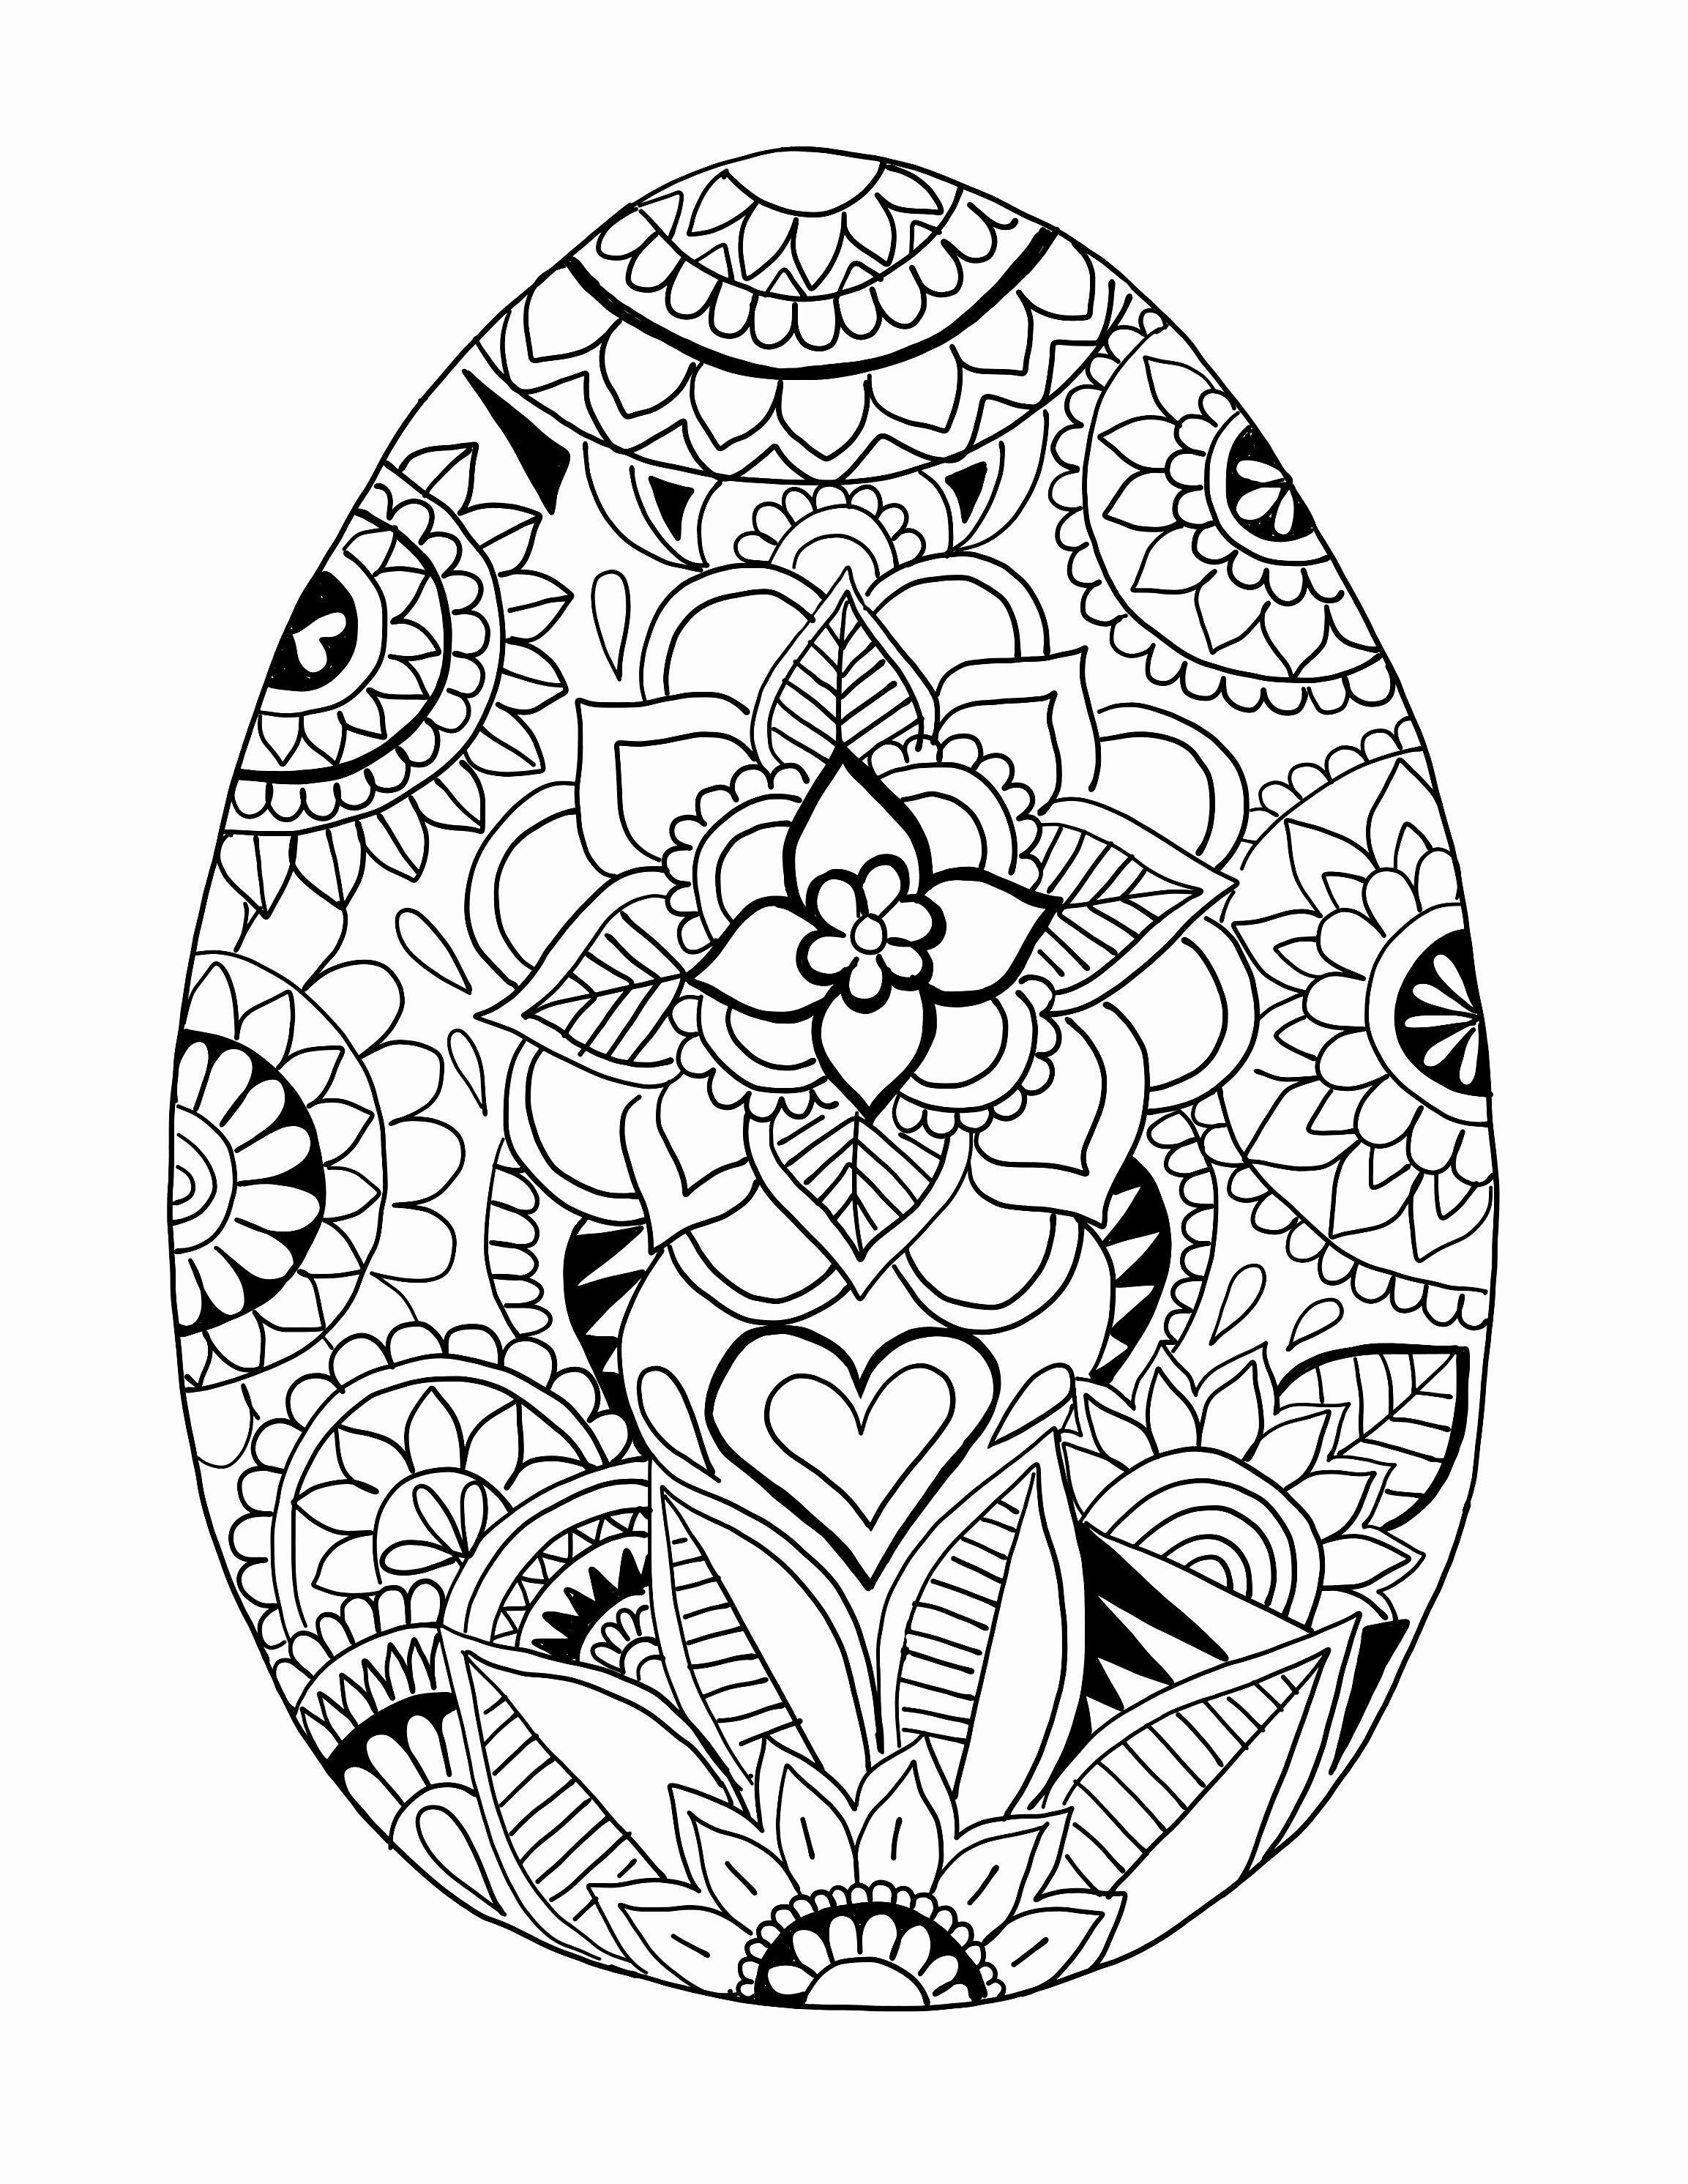 Easter Egg Hunt Coloring Page Easter Egg Coloring Pages Egg